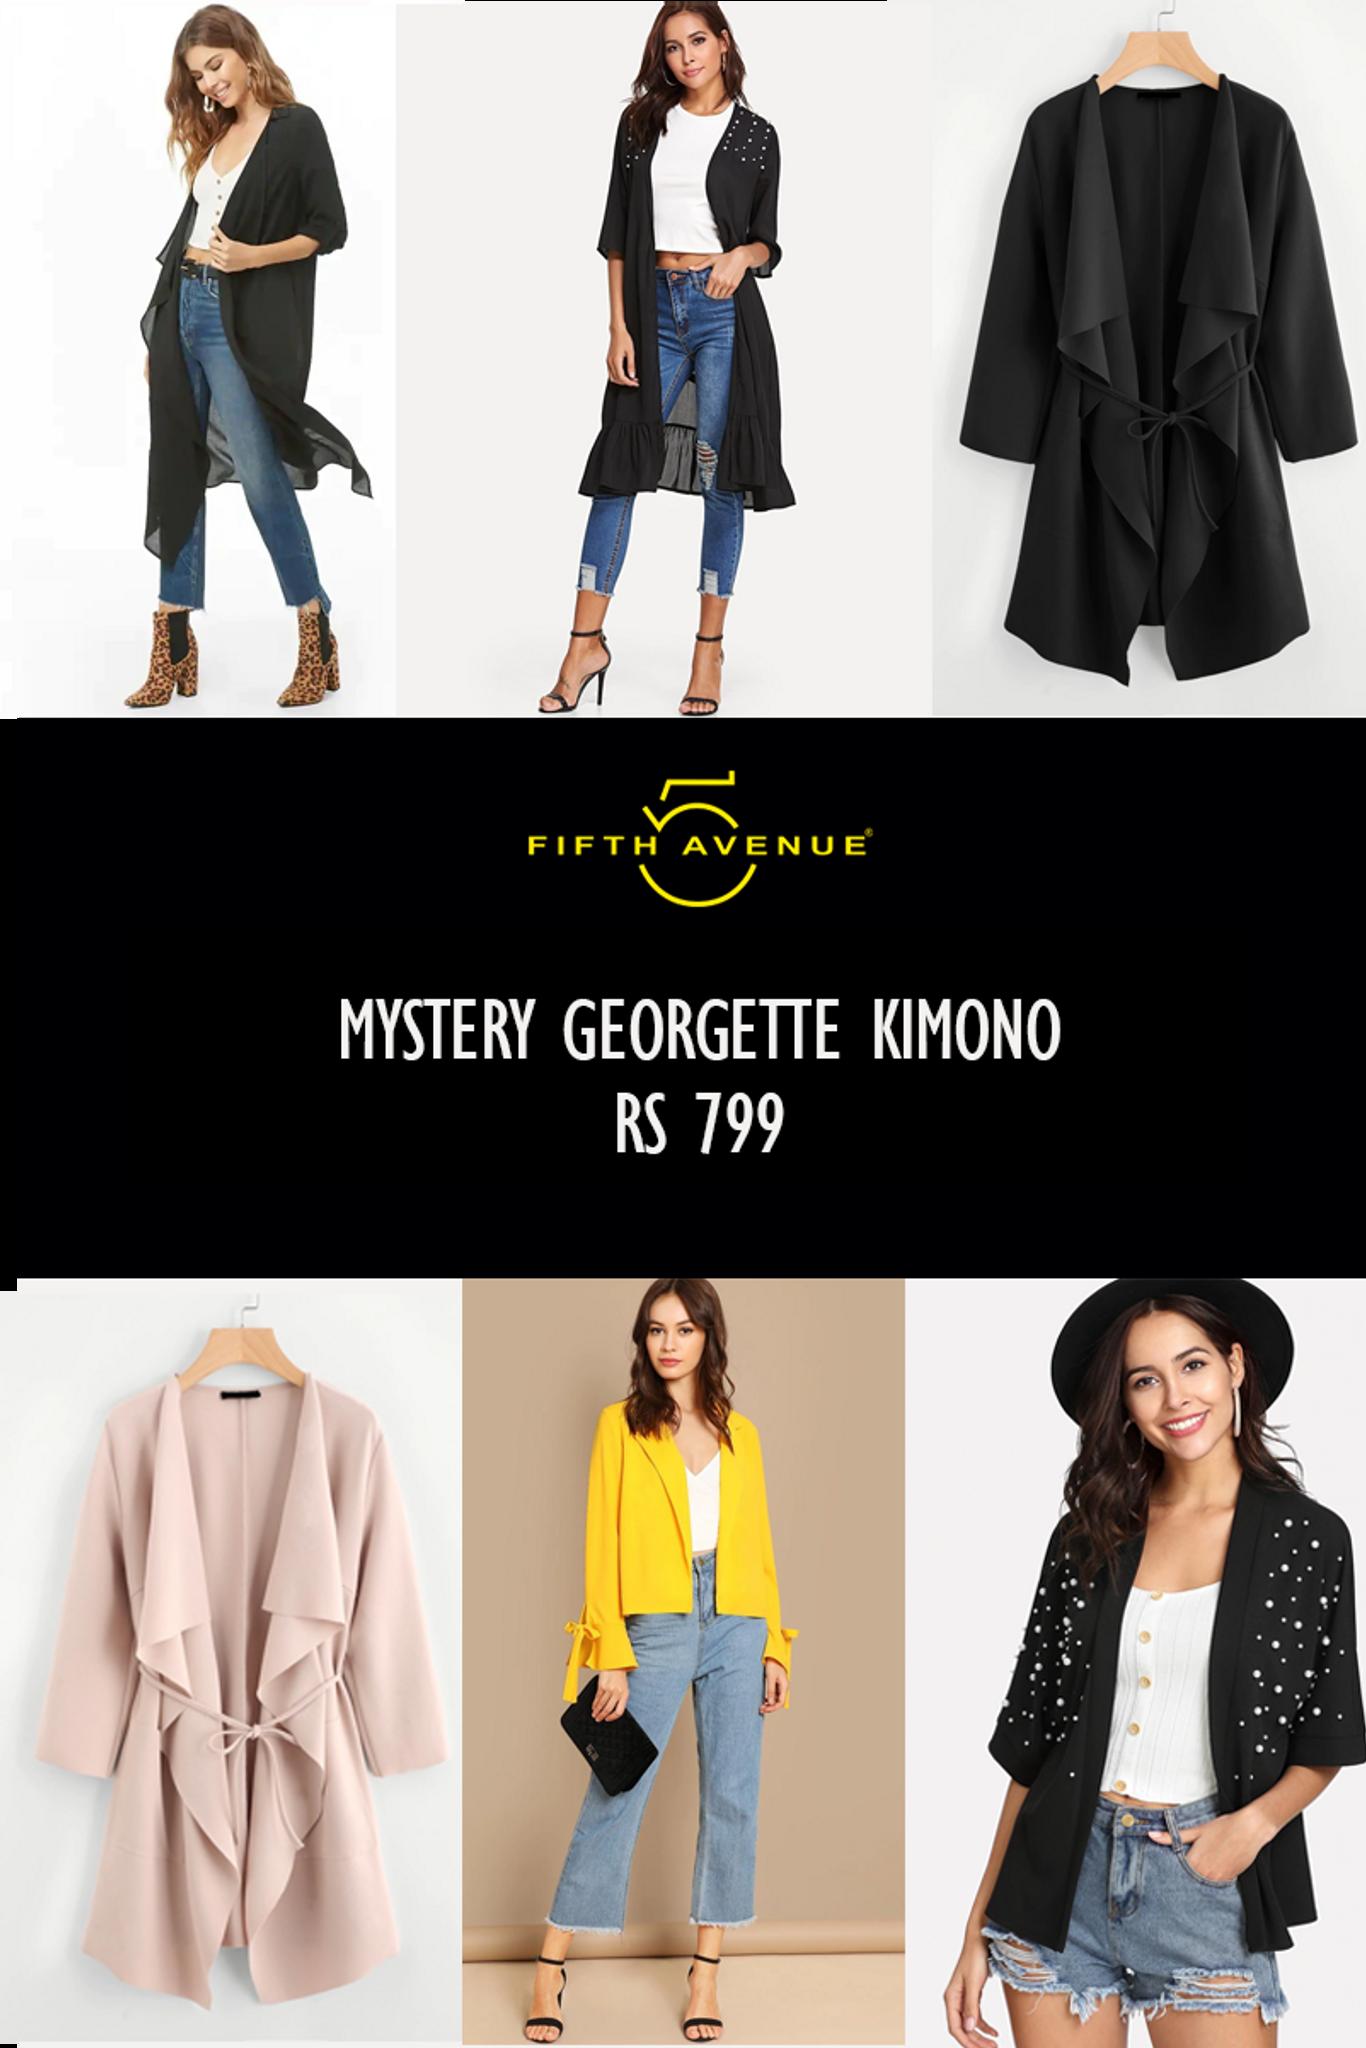 Fifth Avenue Women's Mystery Mania - Mystery Georgette Kimono